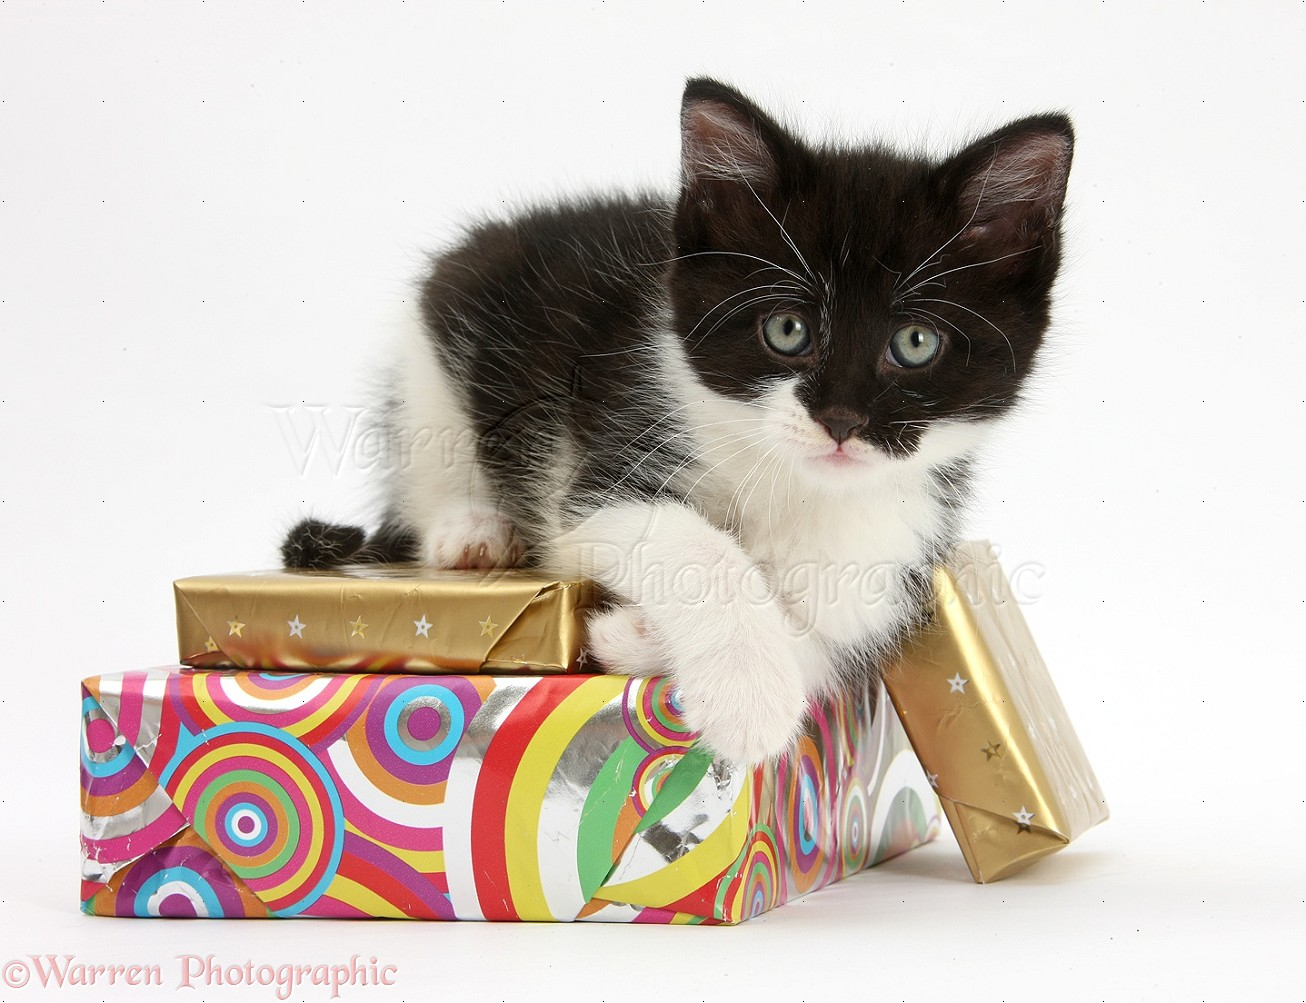 Birthday Kittens Images Kitten Lying on Birthday